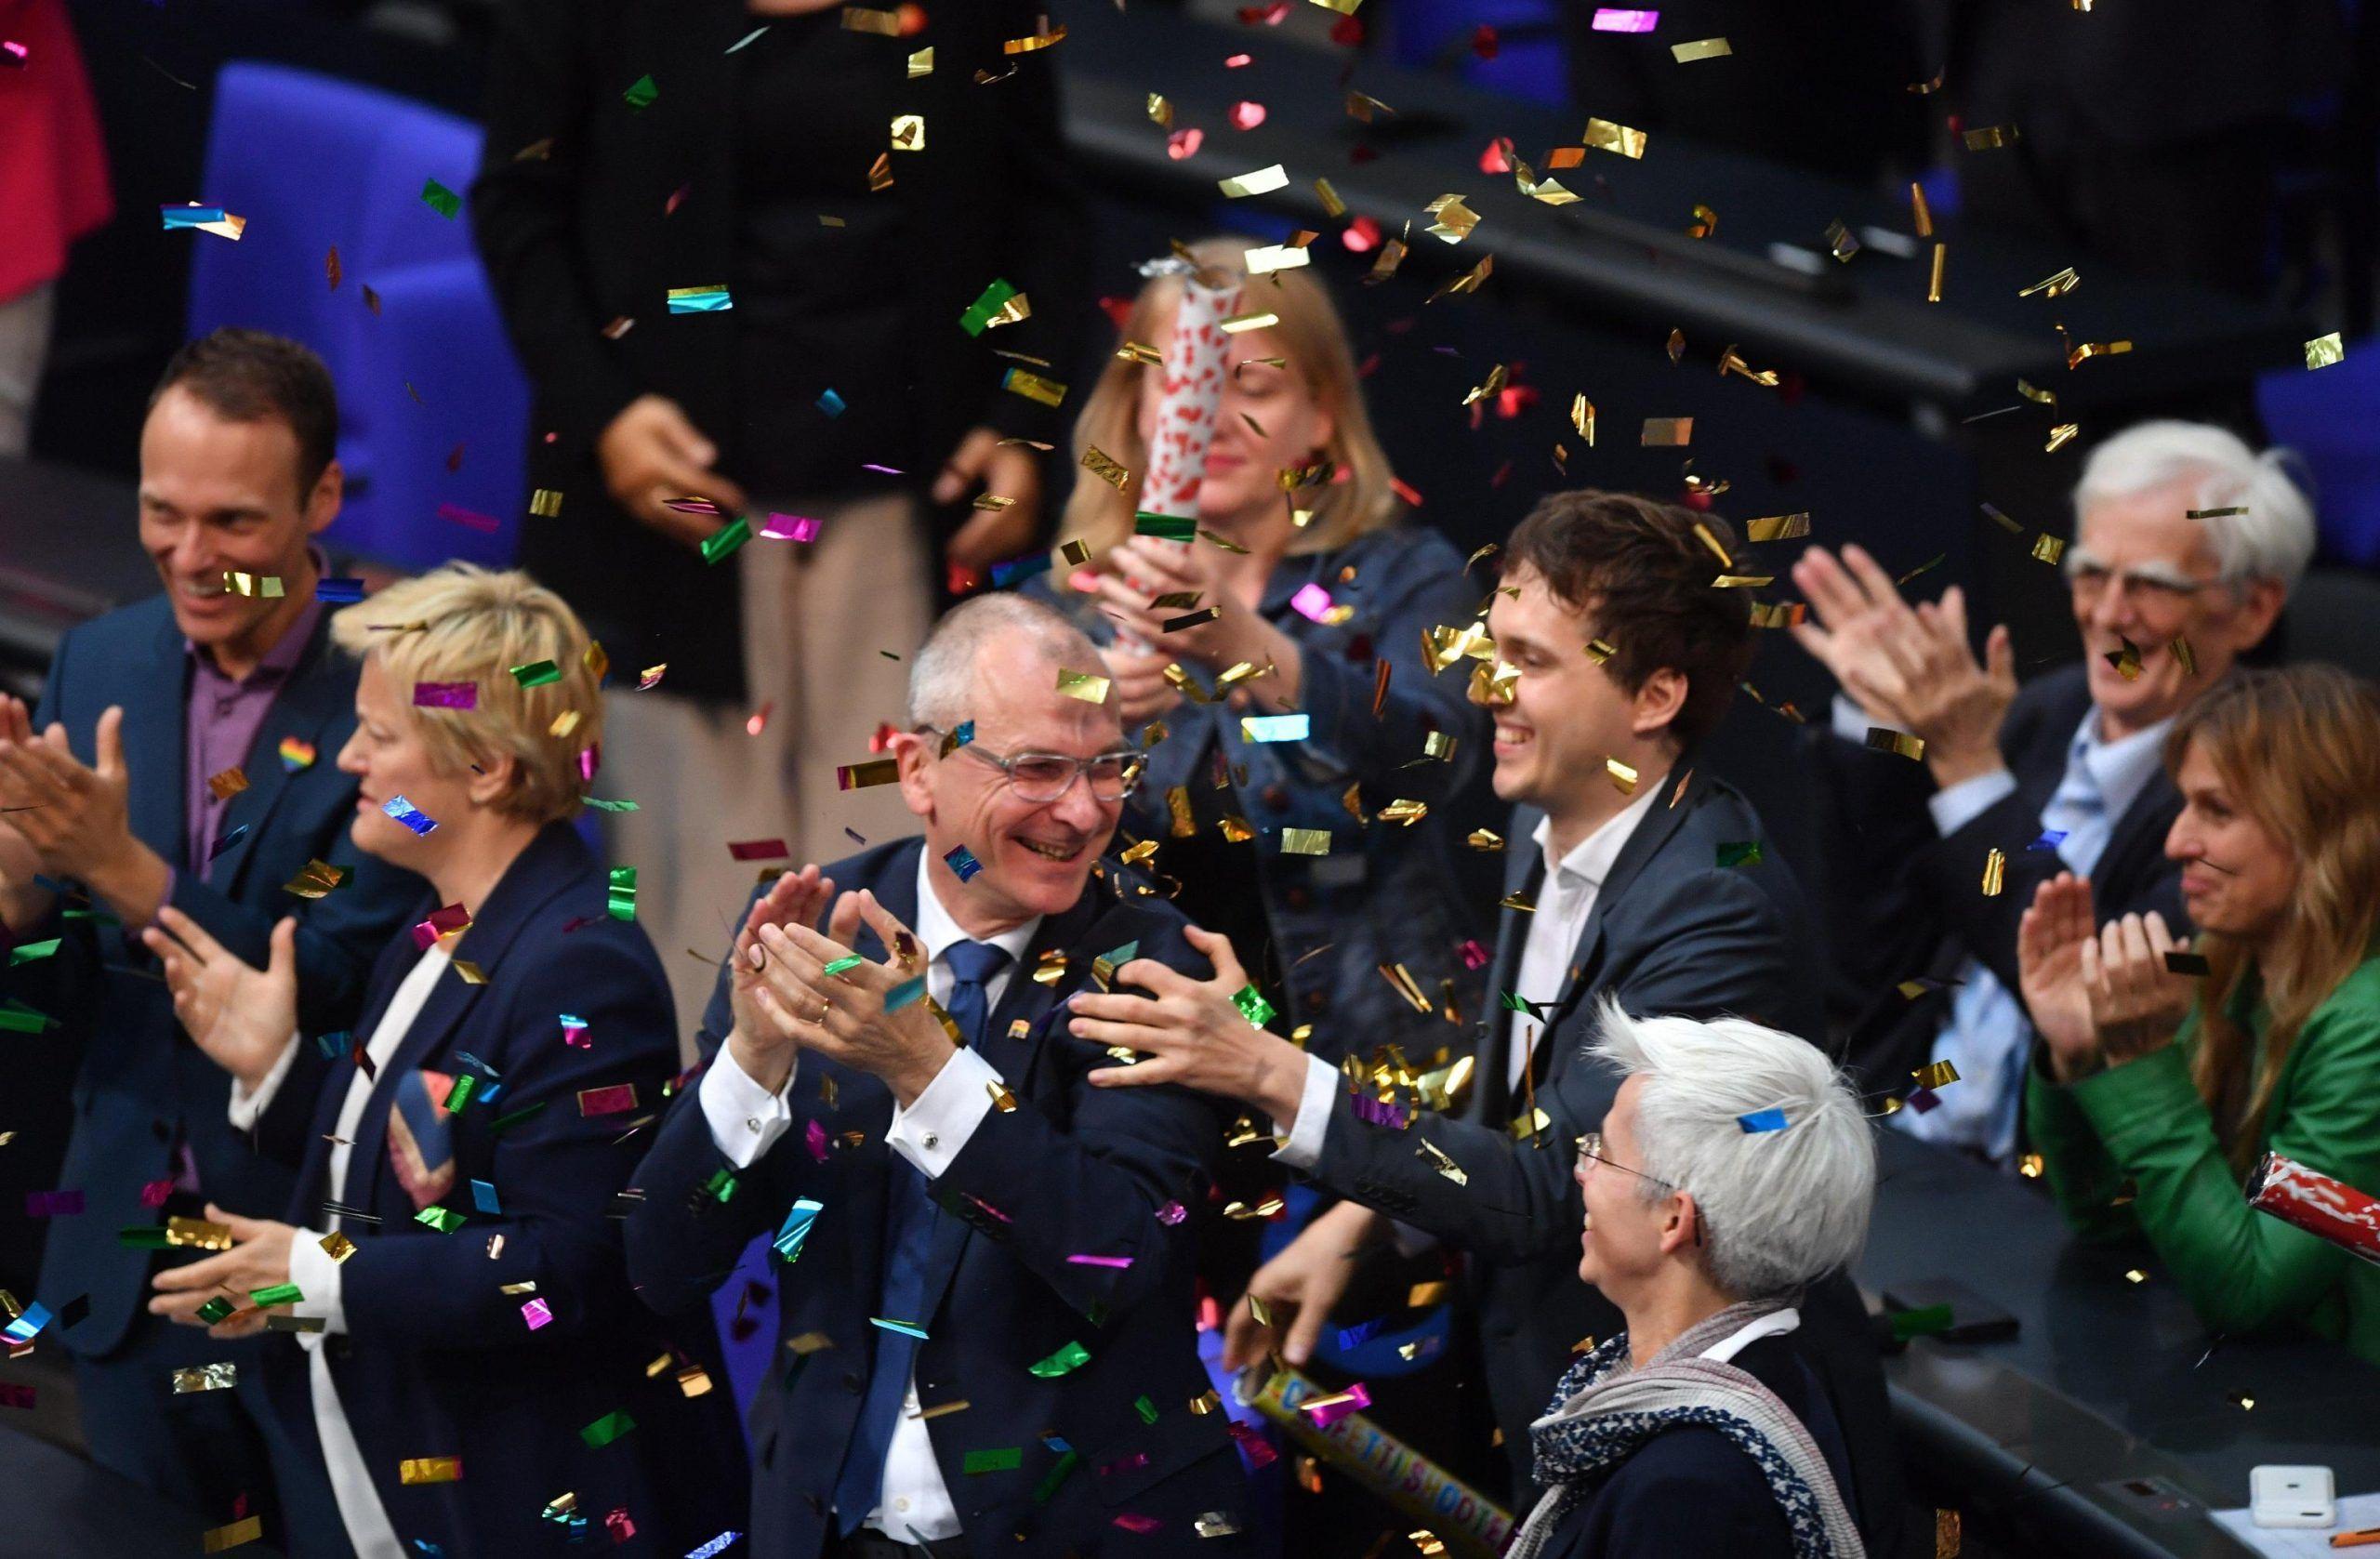 German Parliament votes on legalizing same sex marriages